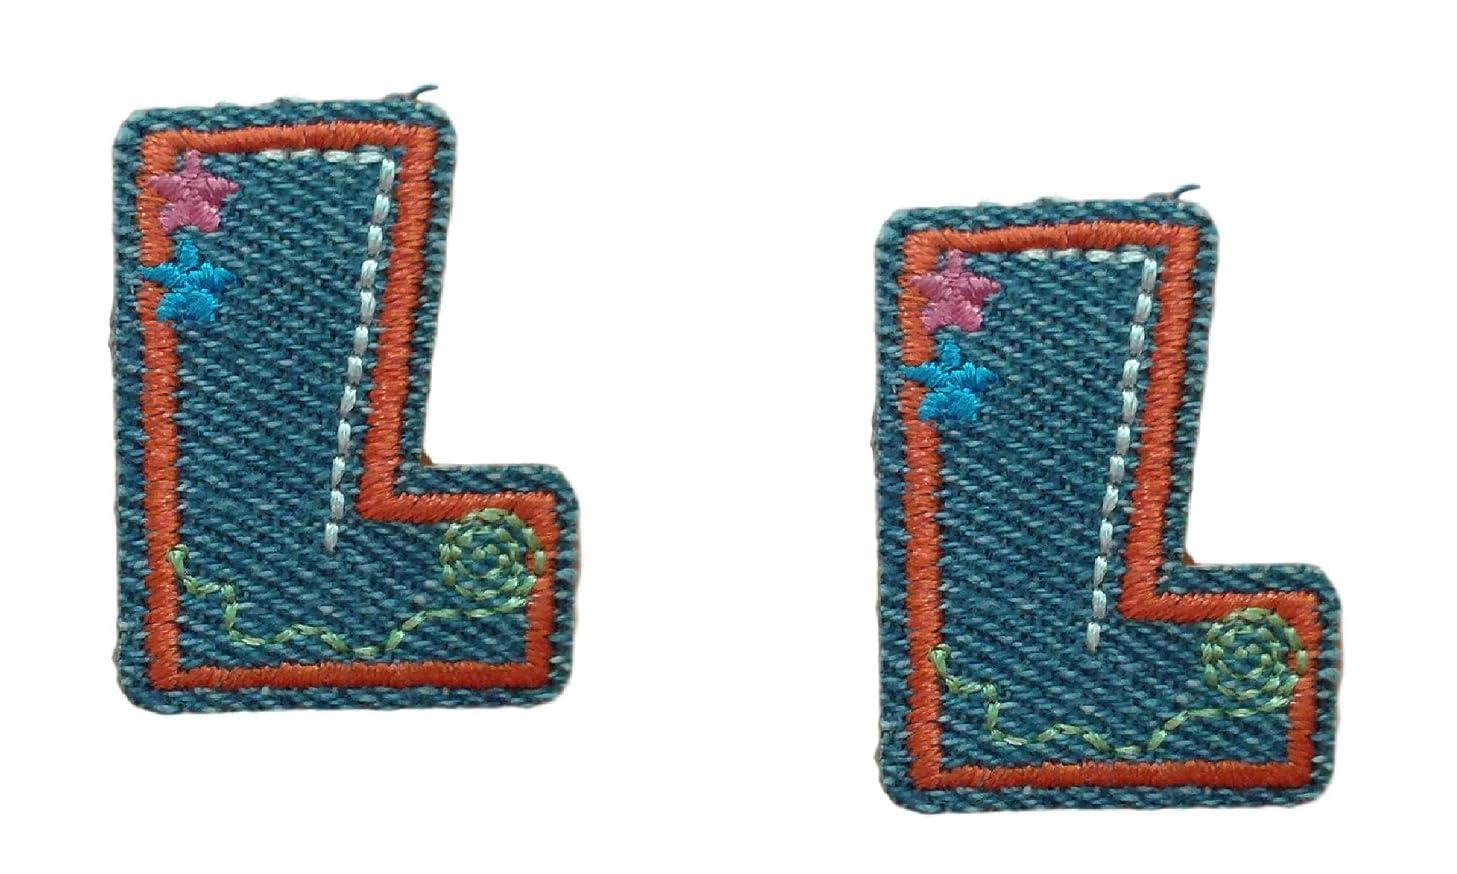 (2) Small Denim Letter L Iron On Patch Applique Motif Alphabet Symbol Scrapbooking Decal 1.4 x 1 inches (3.5 x 2.5 cm)